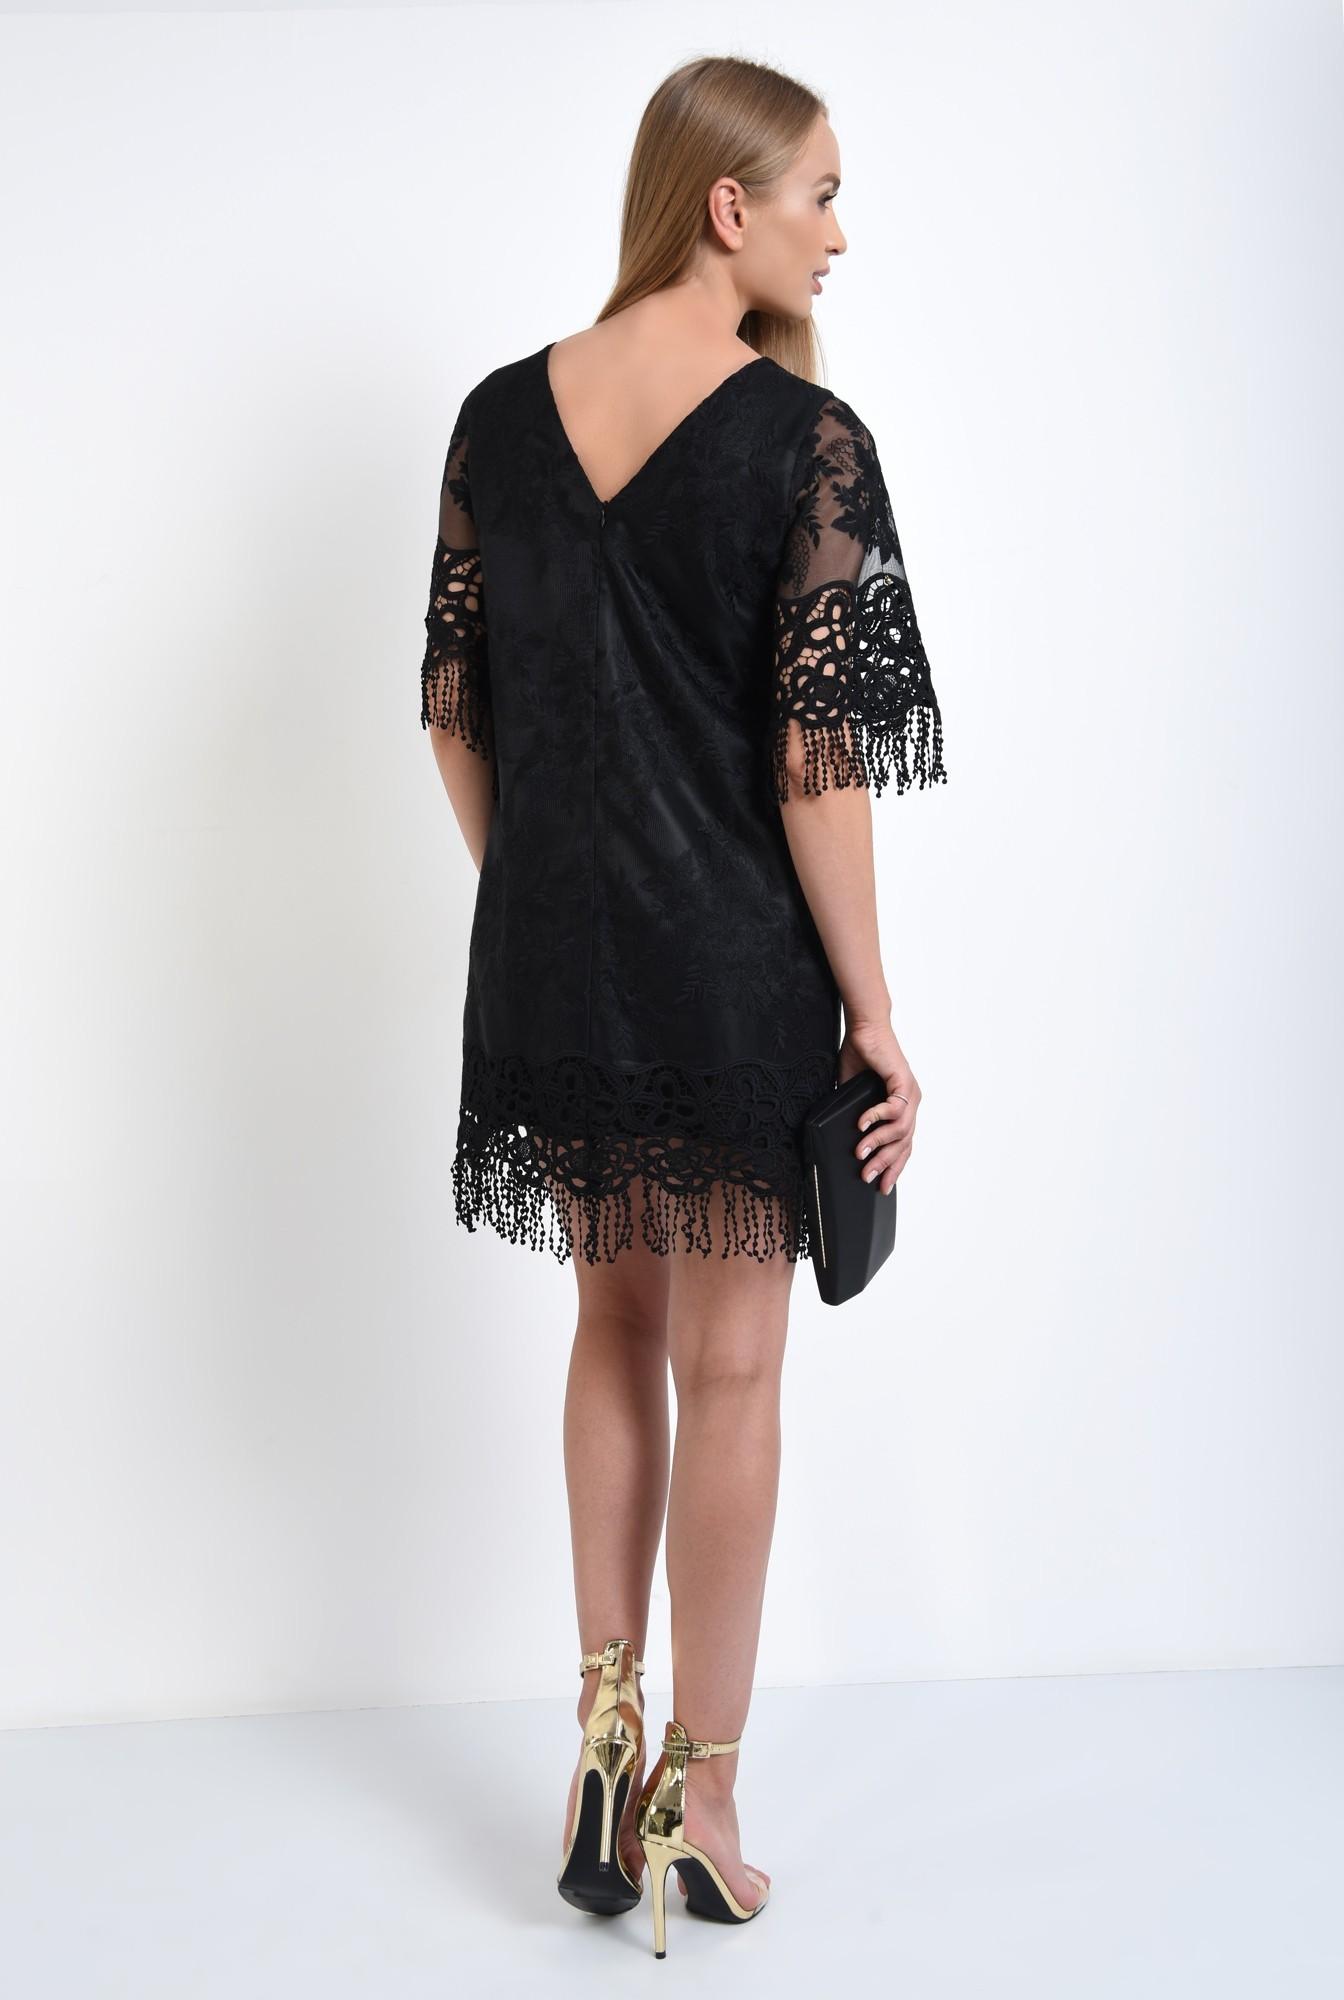 1 - rochie eleganta, dantela brodata, franjuri, rochii online